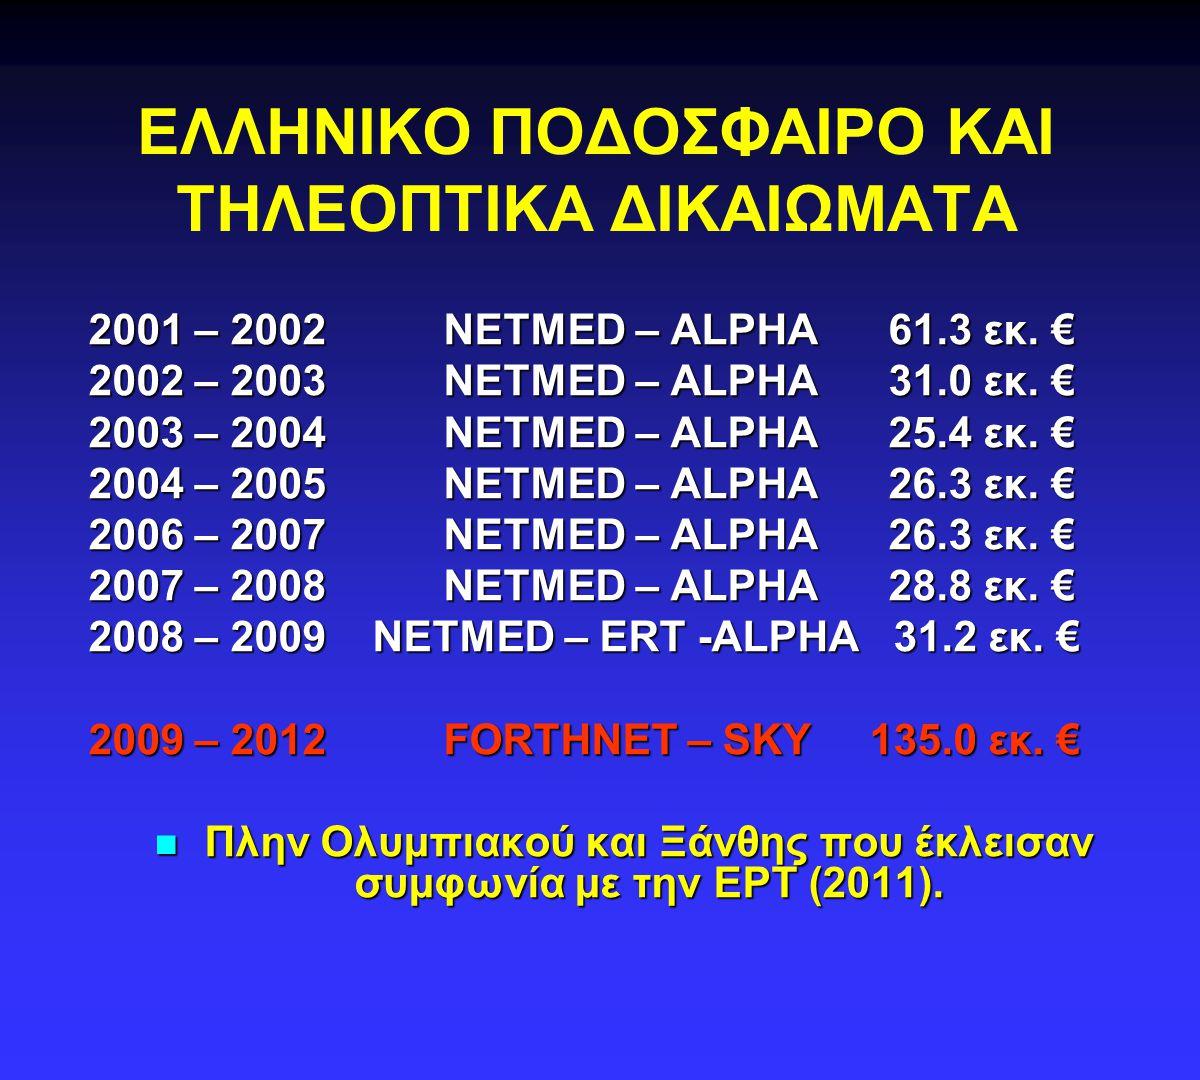 2001 – 2002 NETMED – ALPHA 61.3 εκ.€ 2002 – 2003 NETMED – ALPHA 31.0 εκ.